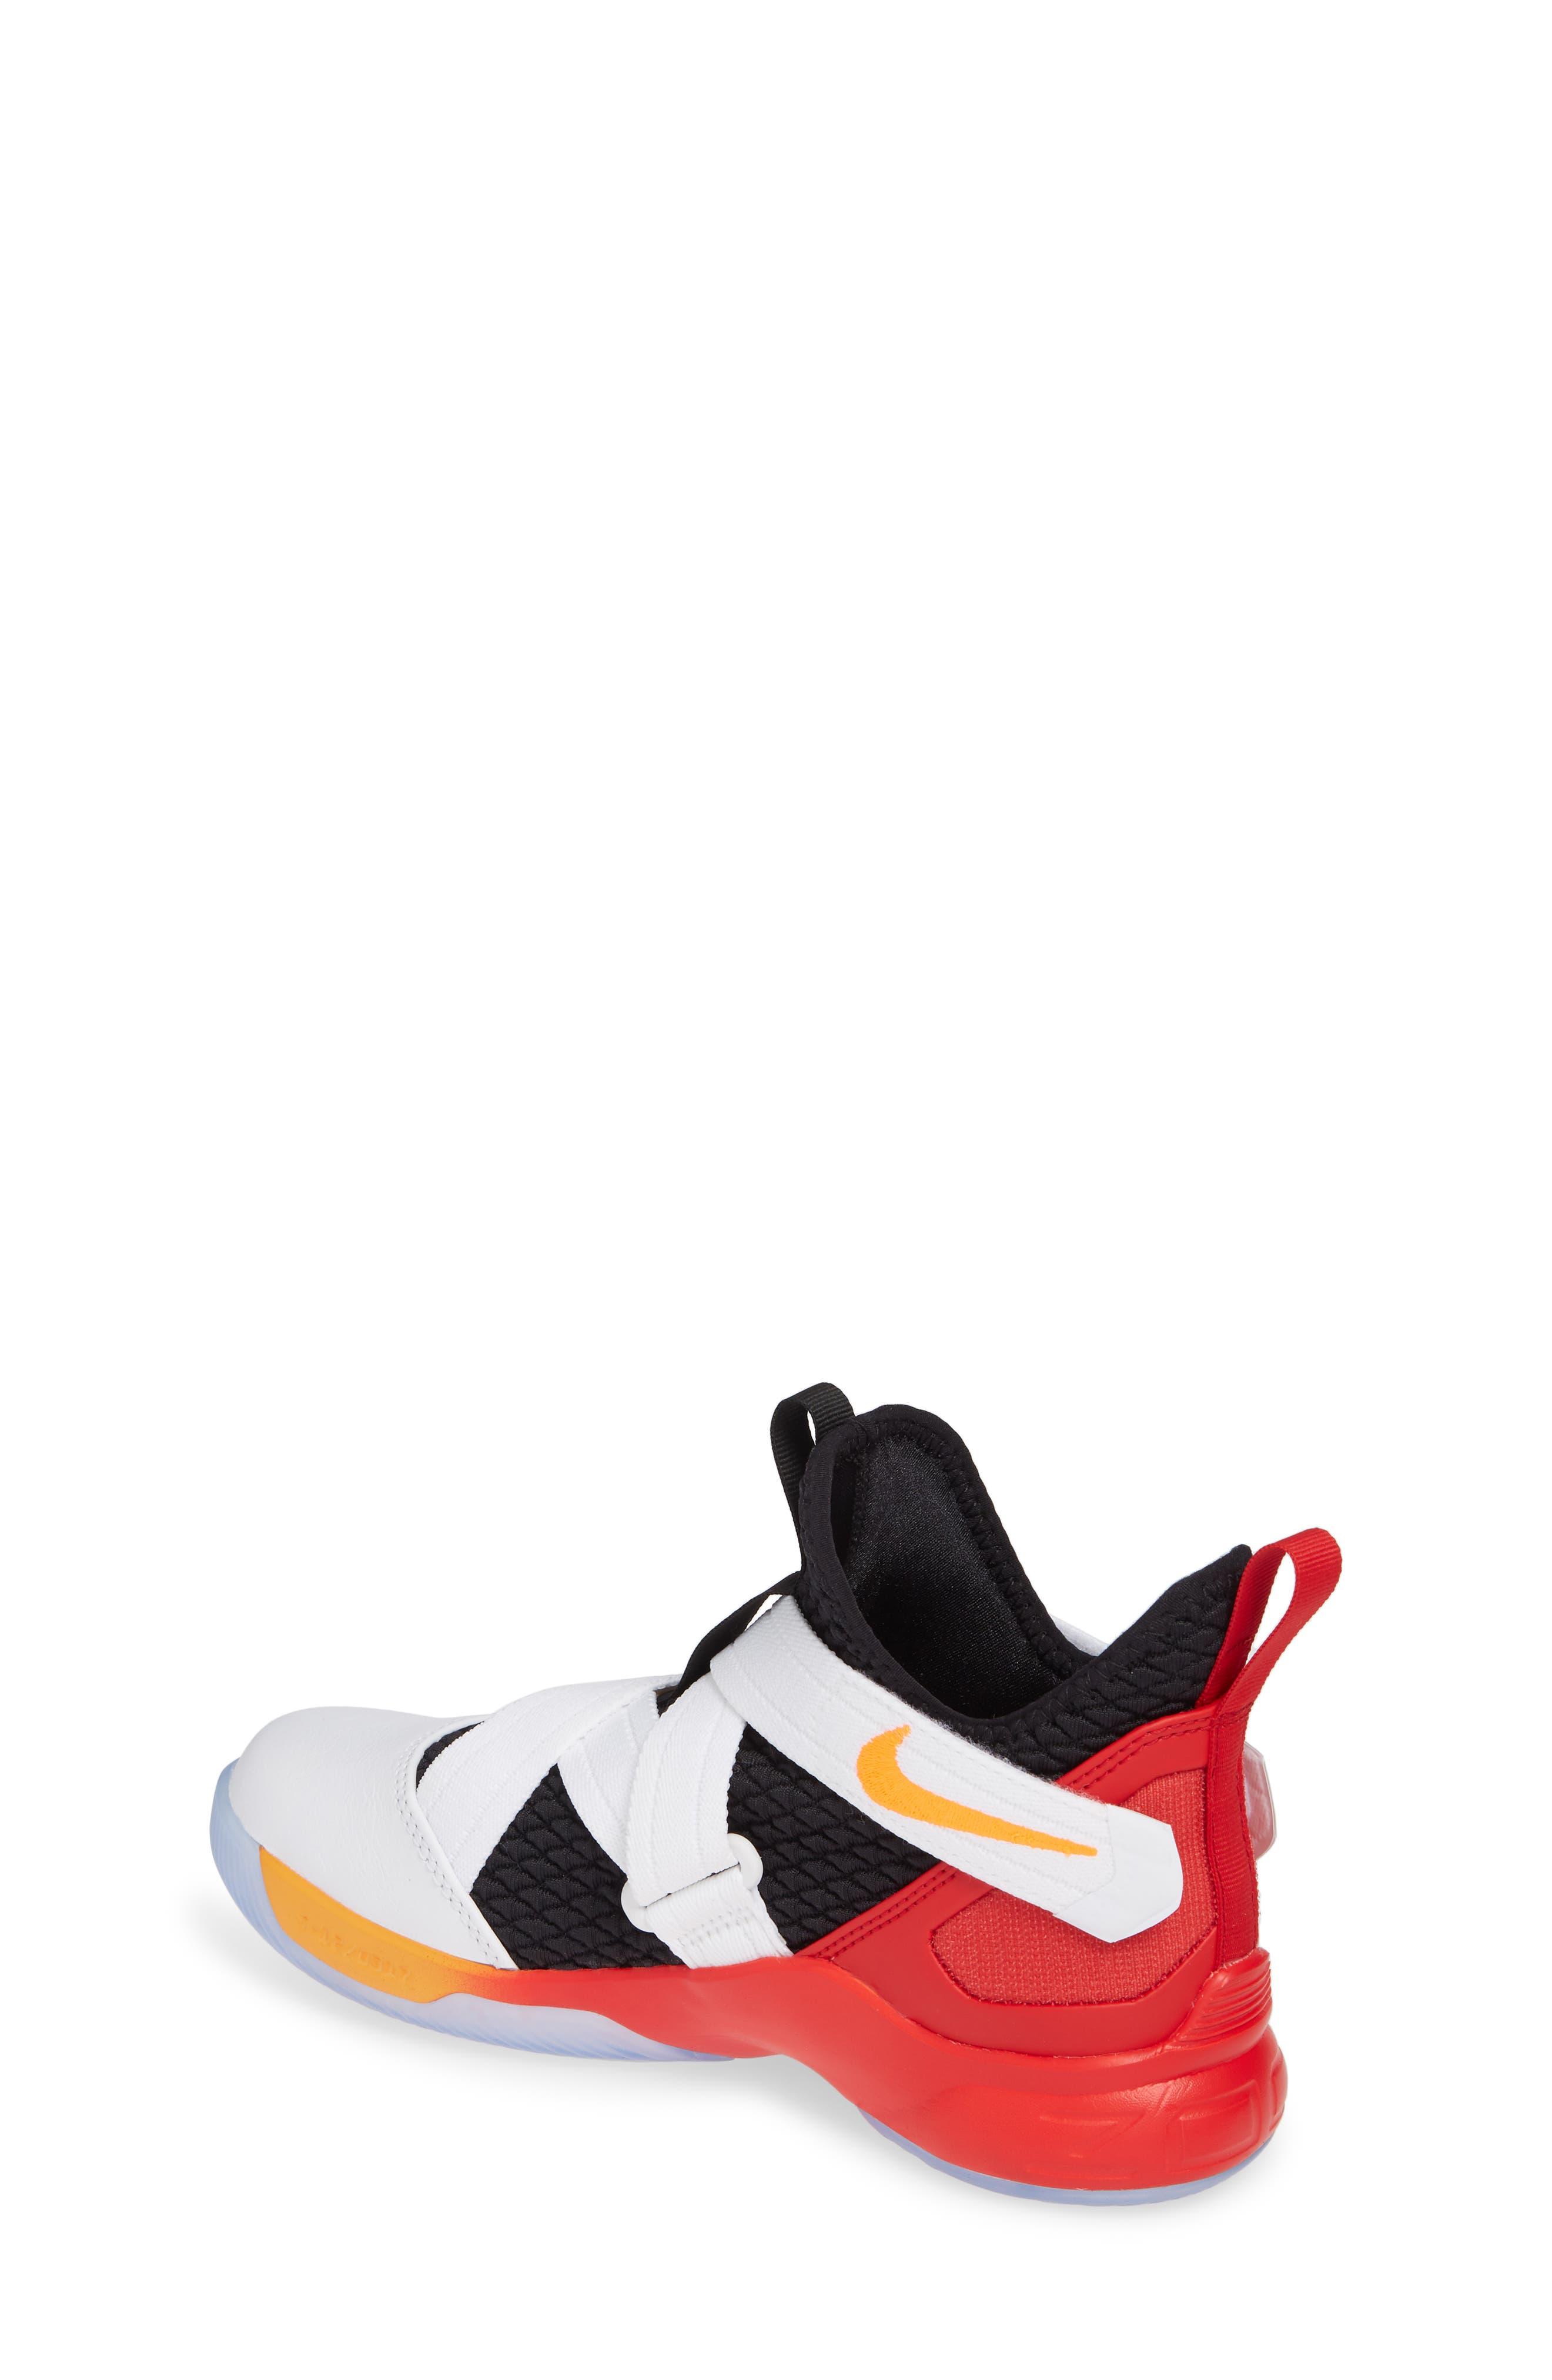 NIKE, LeBron Soldier XII Basketball Shoe, Alternate thumbnail 2, color, WHITE/ LASER ORANGE-BLACK-RED